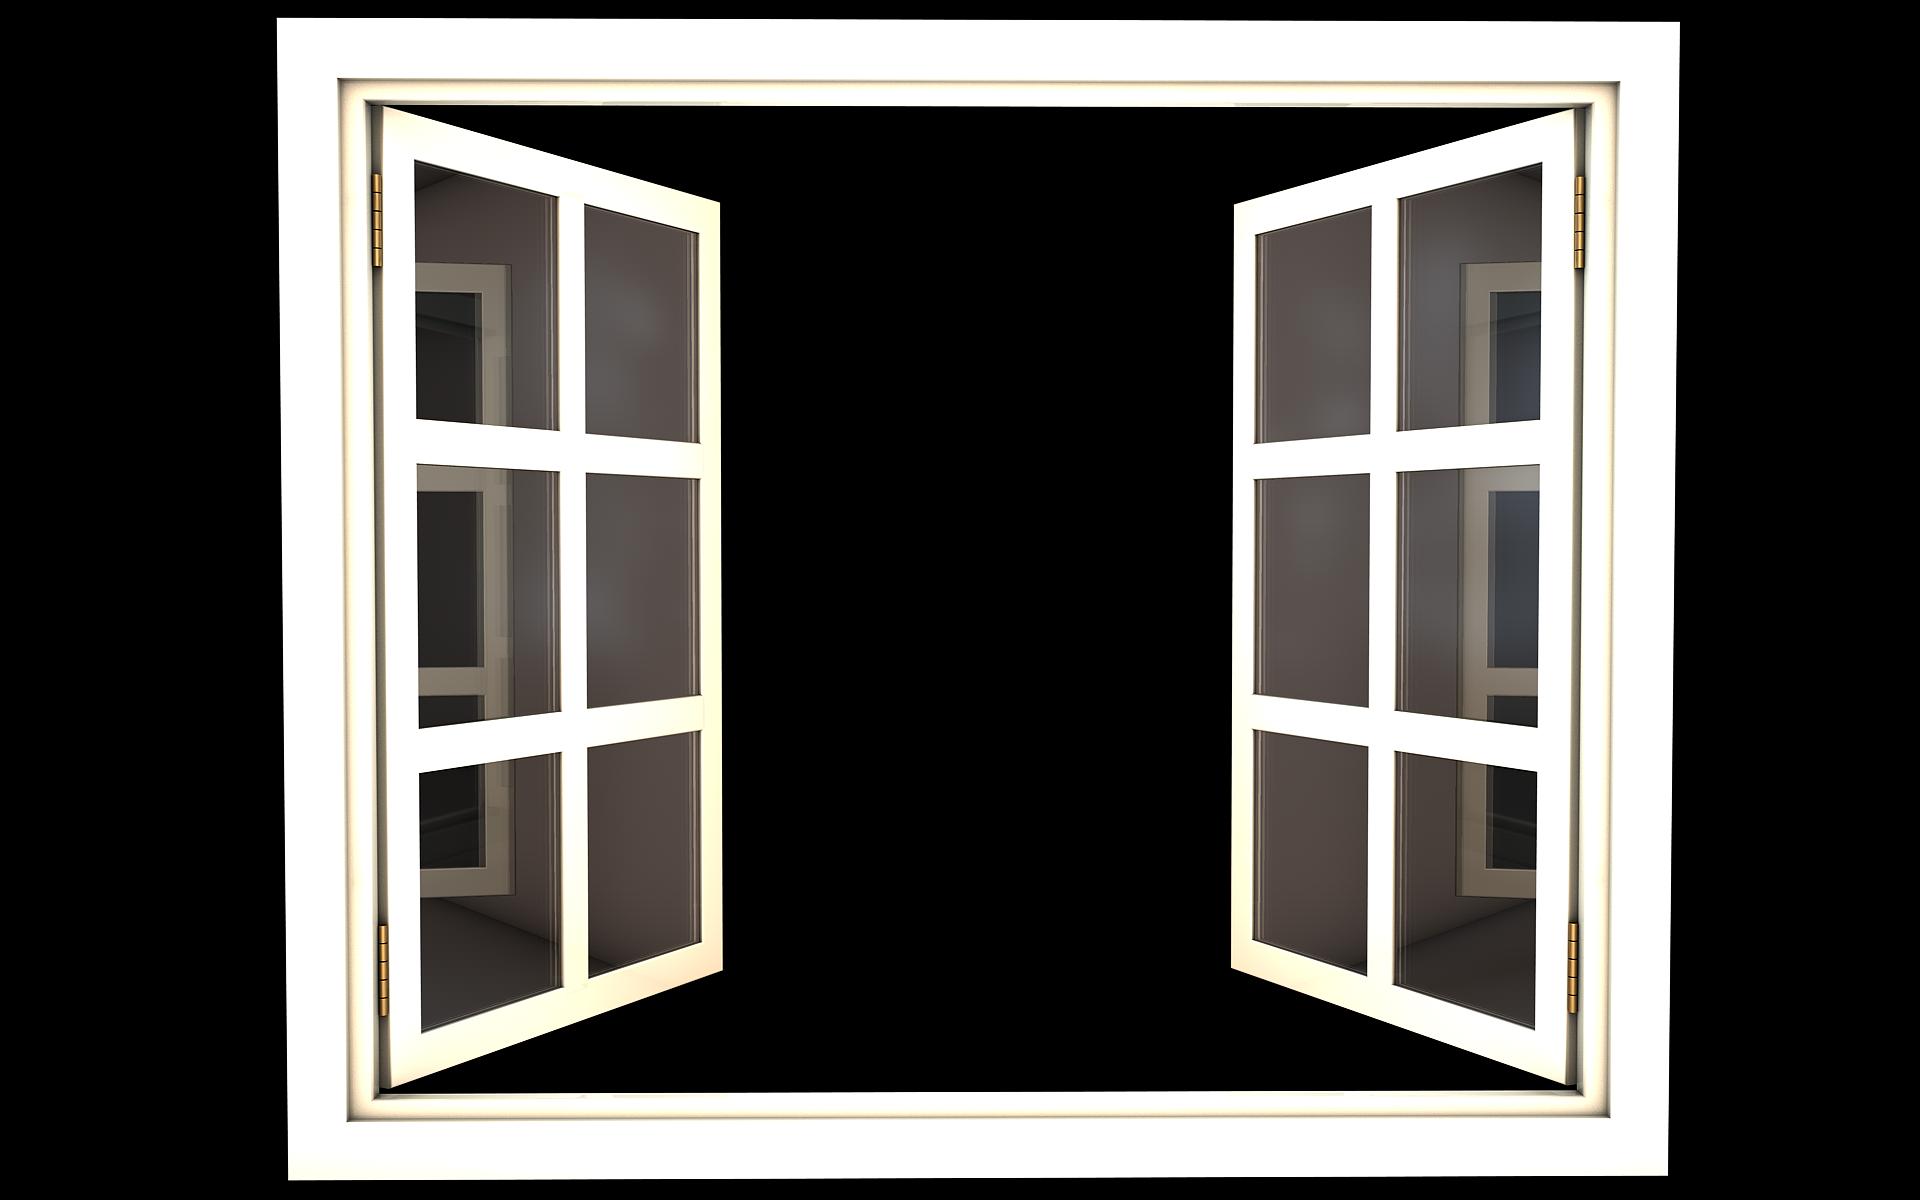 Window frame 1 by on deviantart for Window frame design